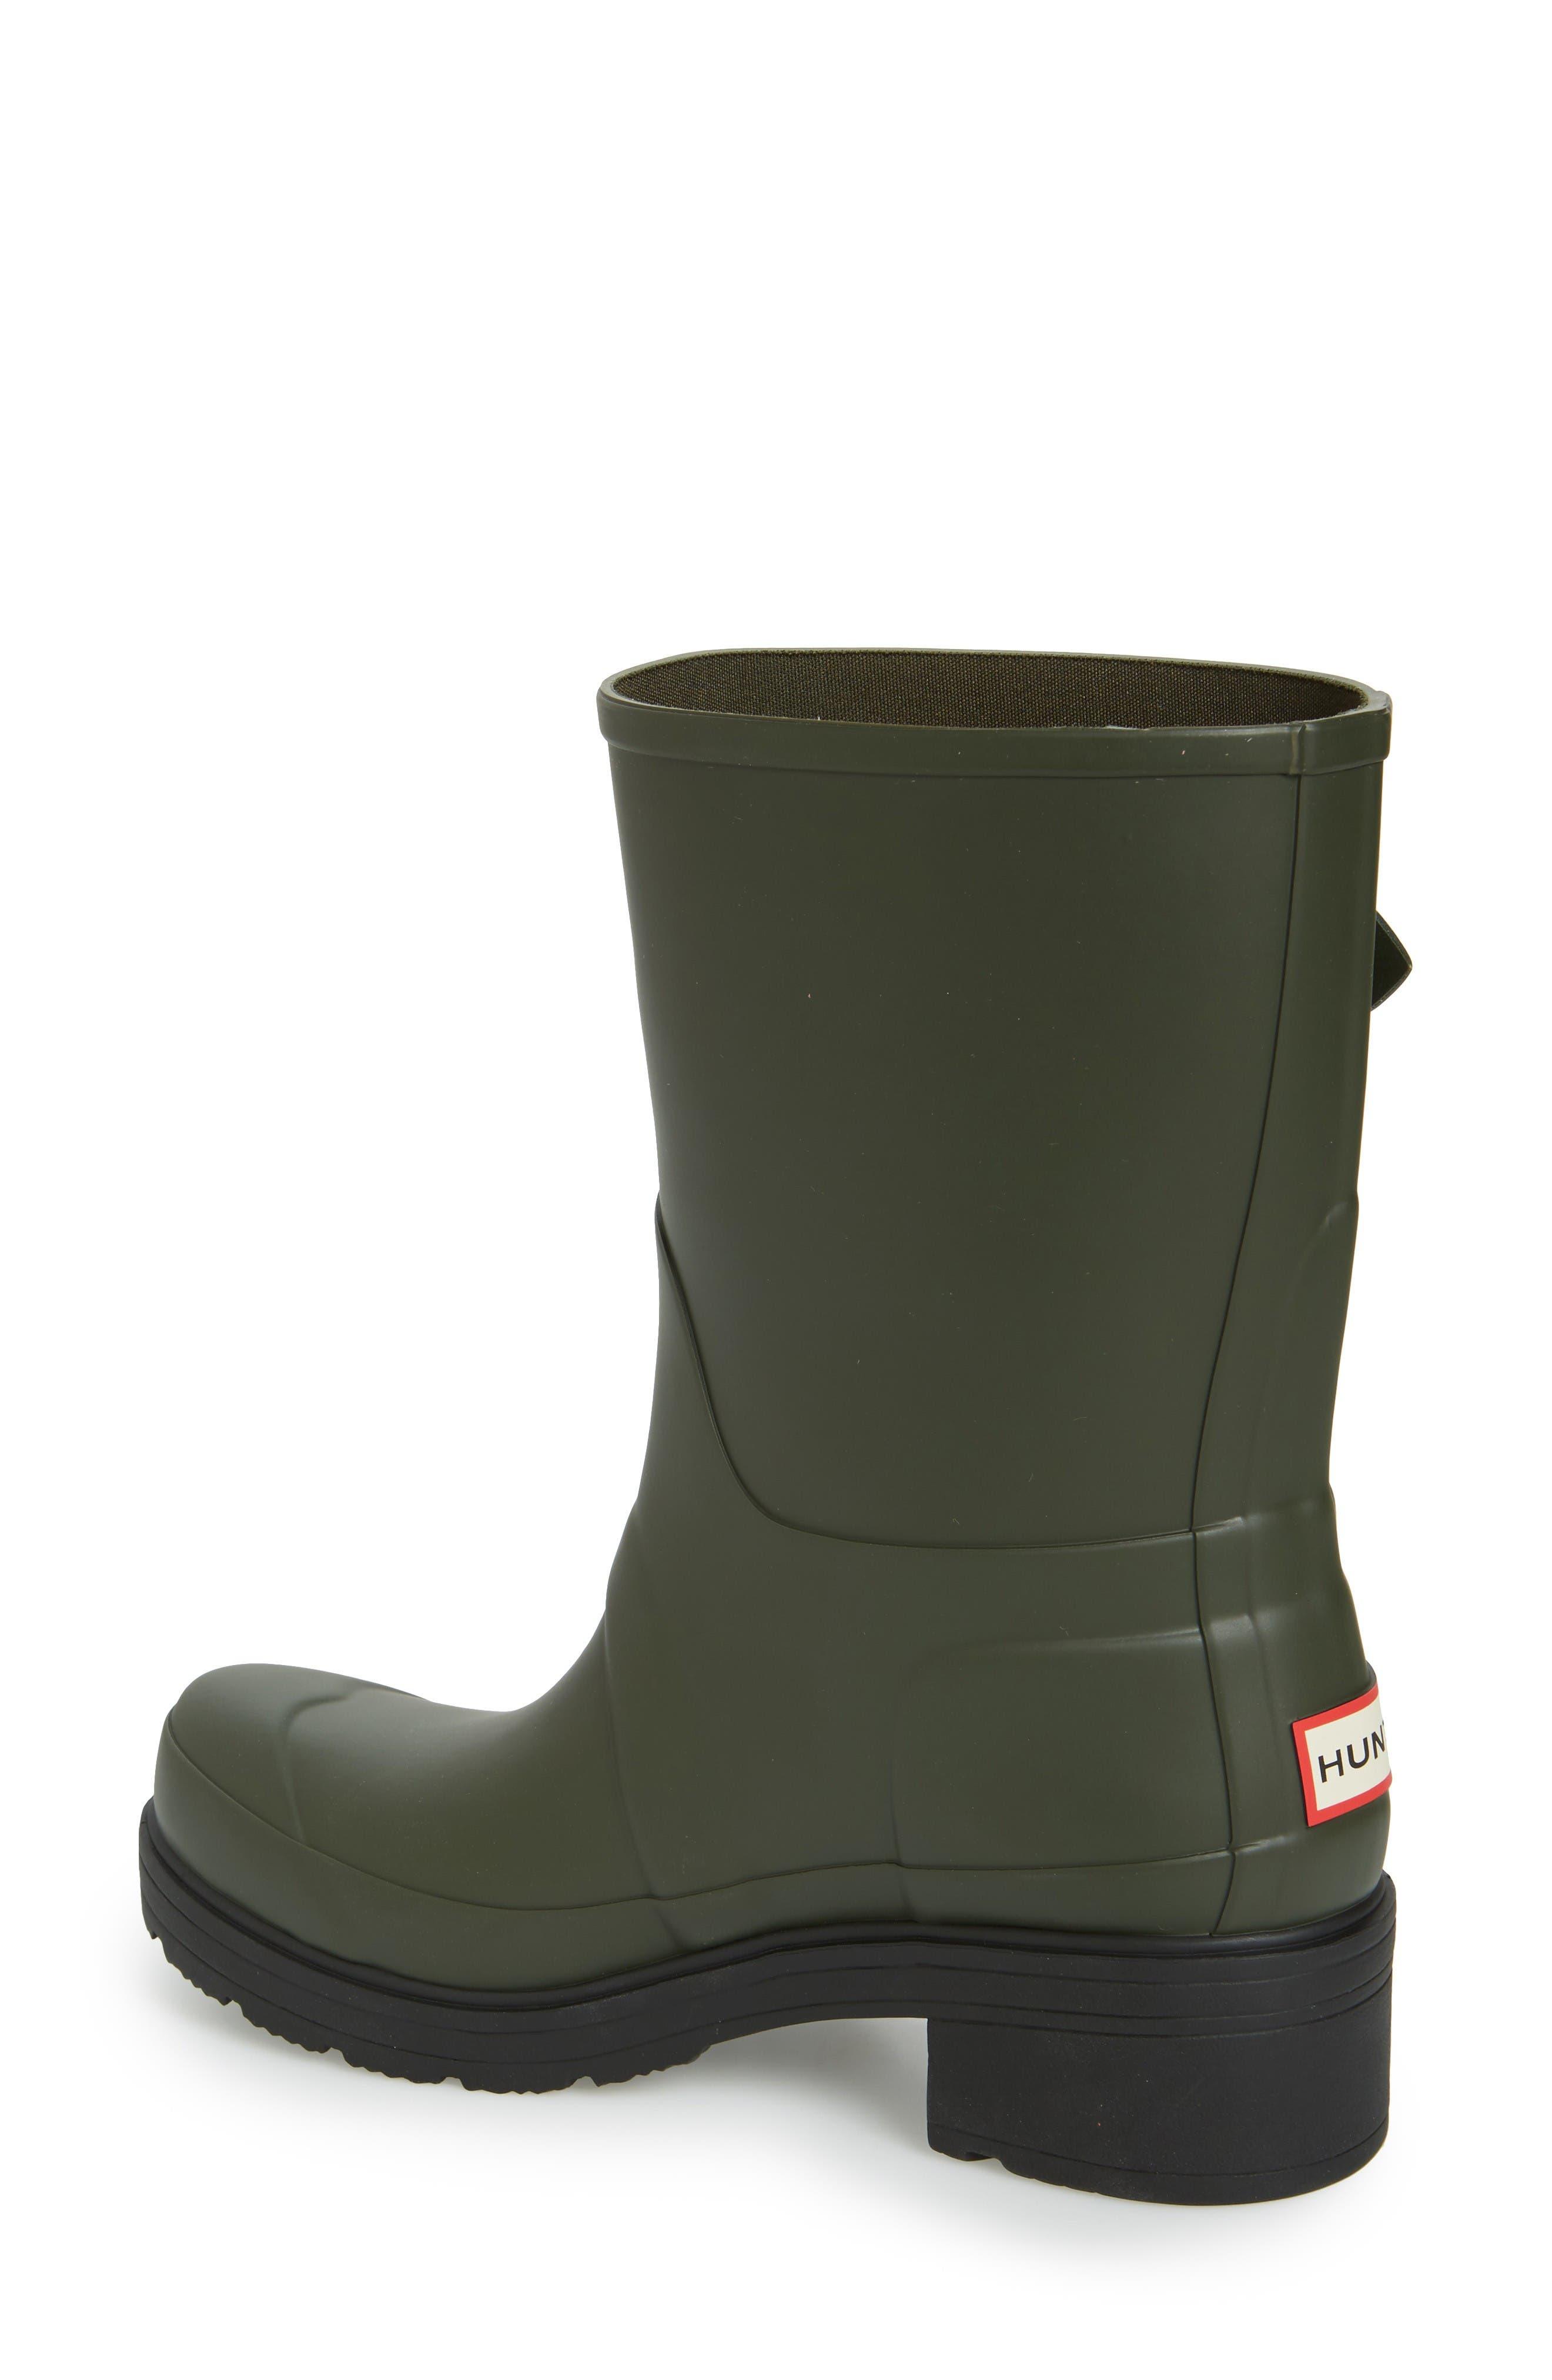 Alternate Image 2  - Hunter 'Original' Waterproof Ankle Rain Boot (Women)